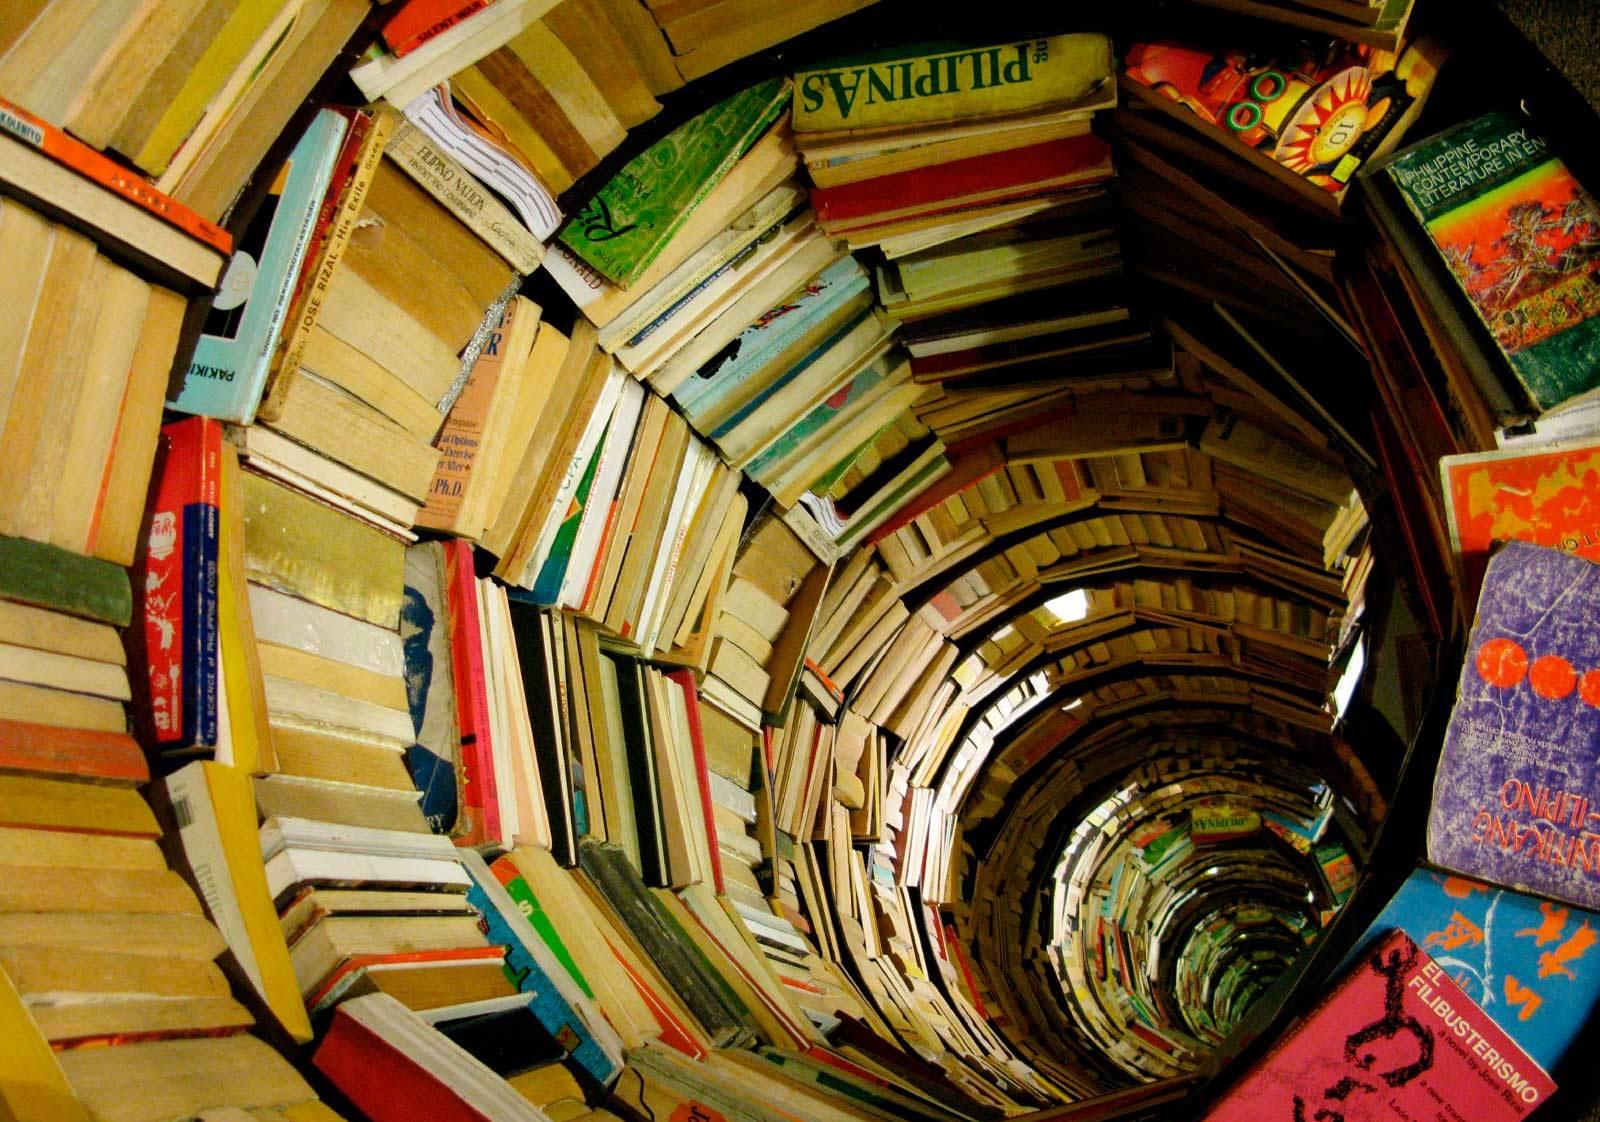 tunel libros